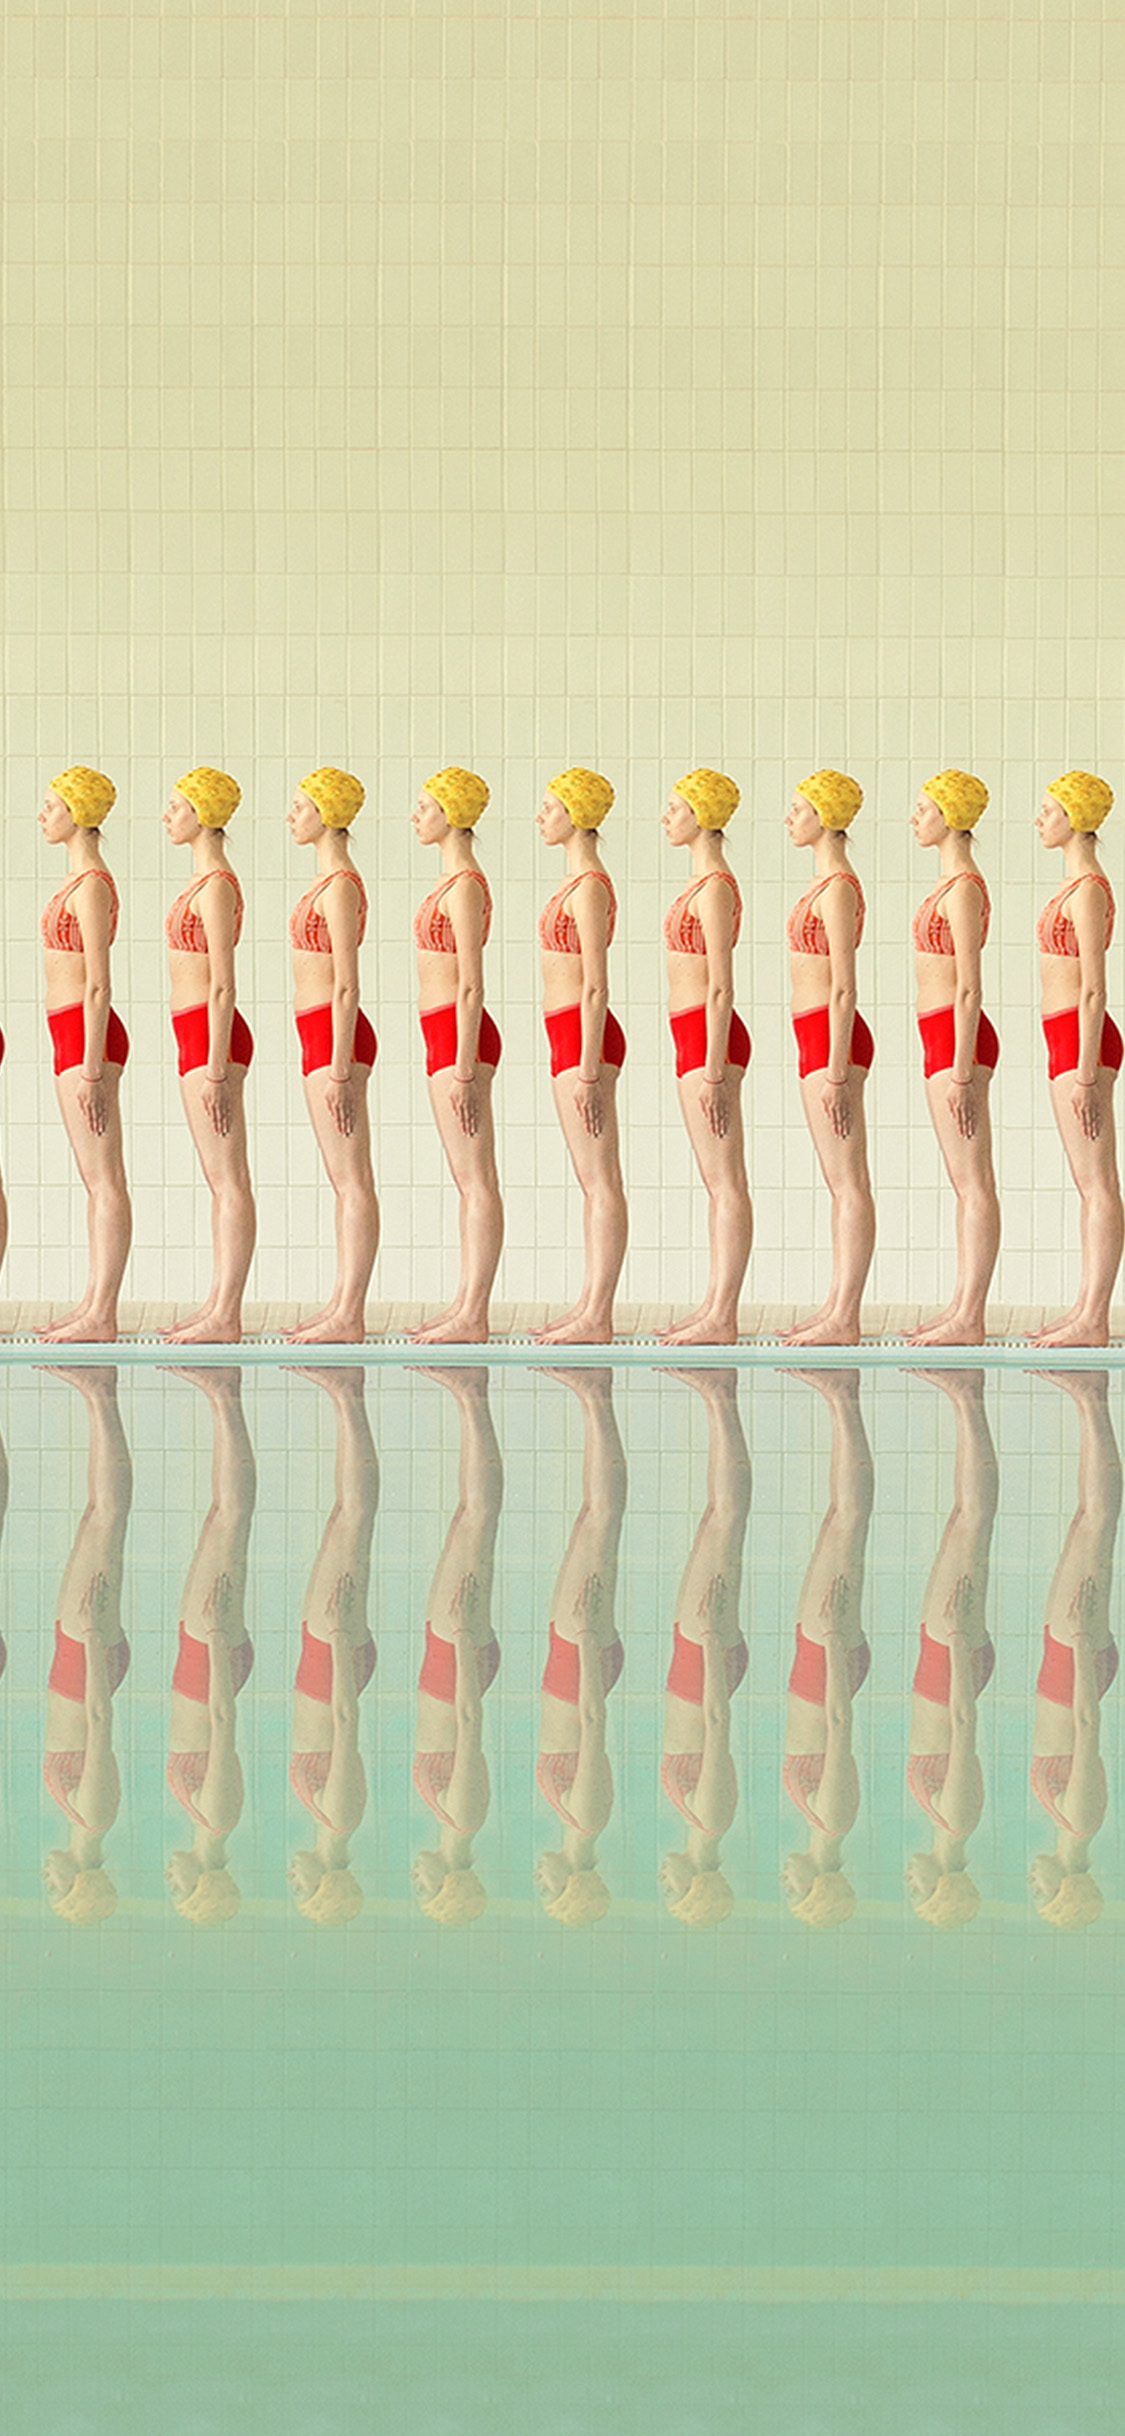 iPhonexpapers.com-Apple-iPhone-wallpaper-bk42-art-swimming-pool-girls